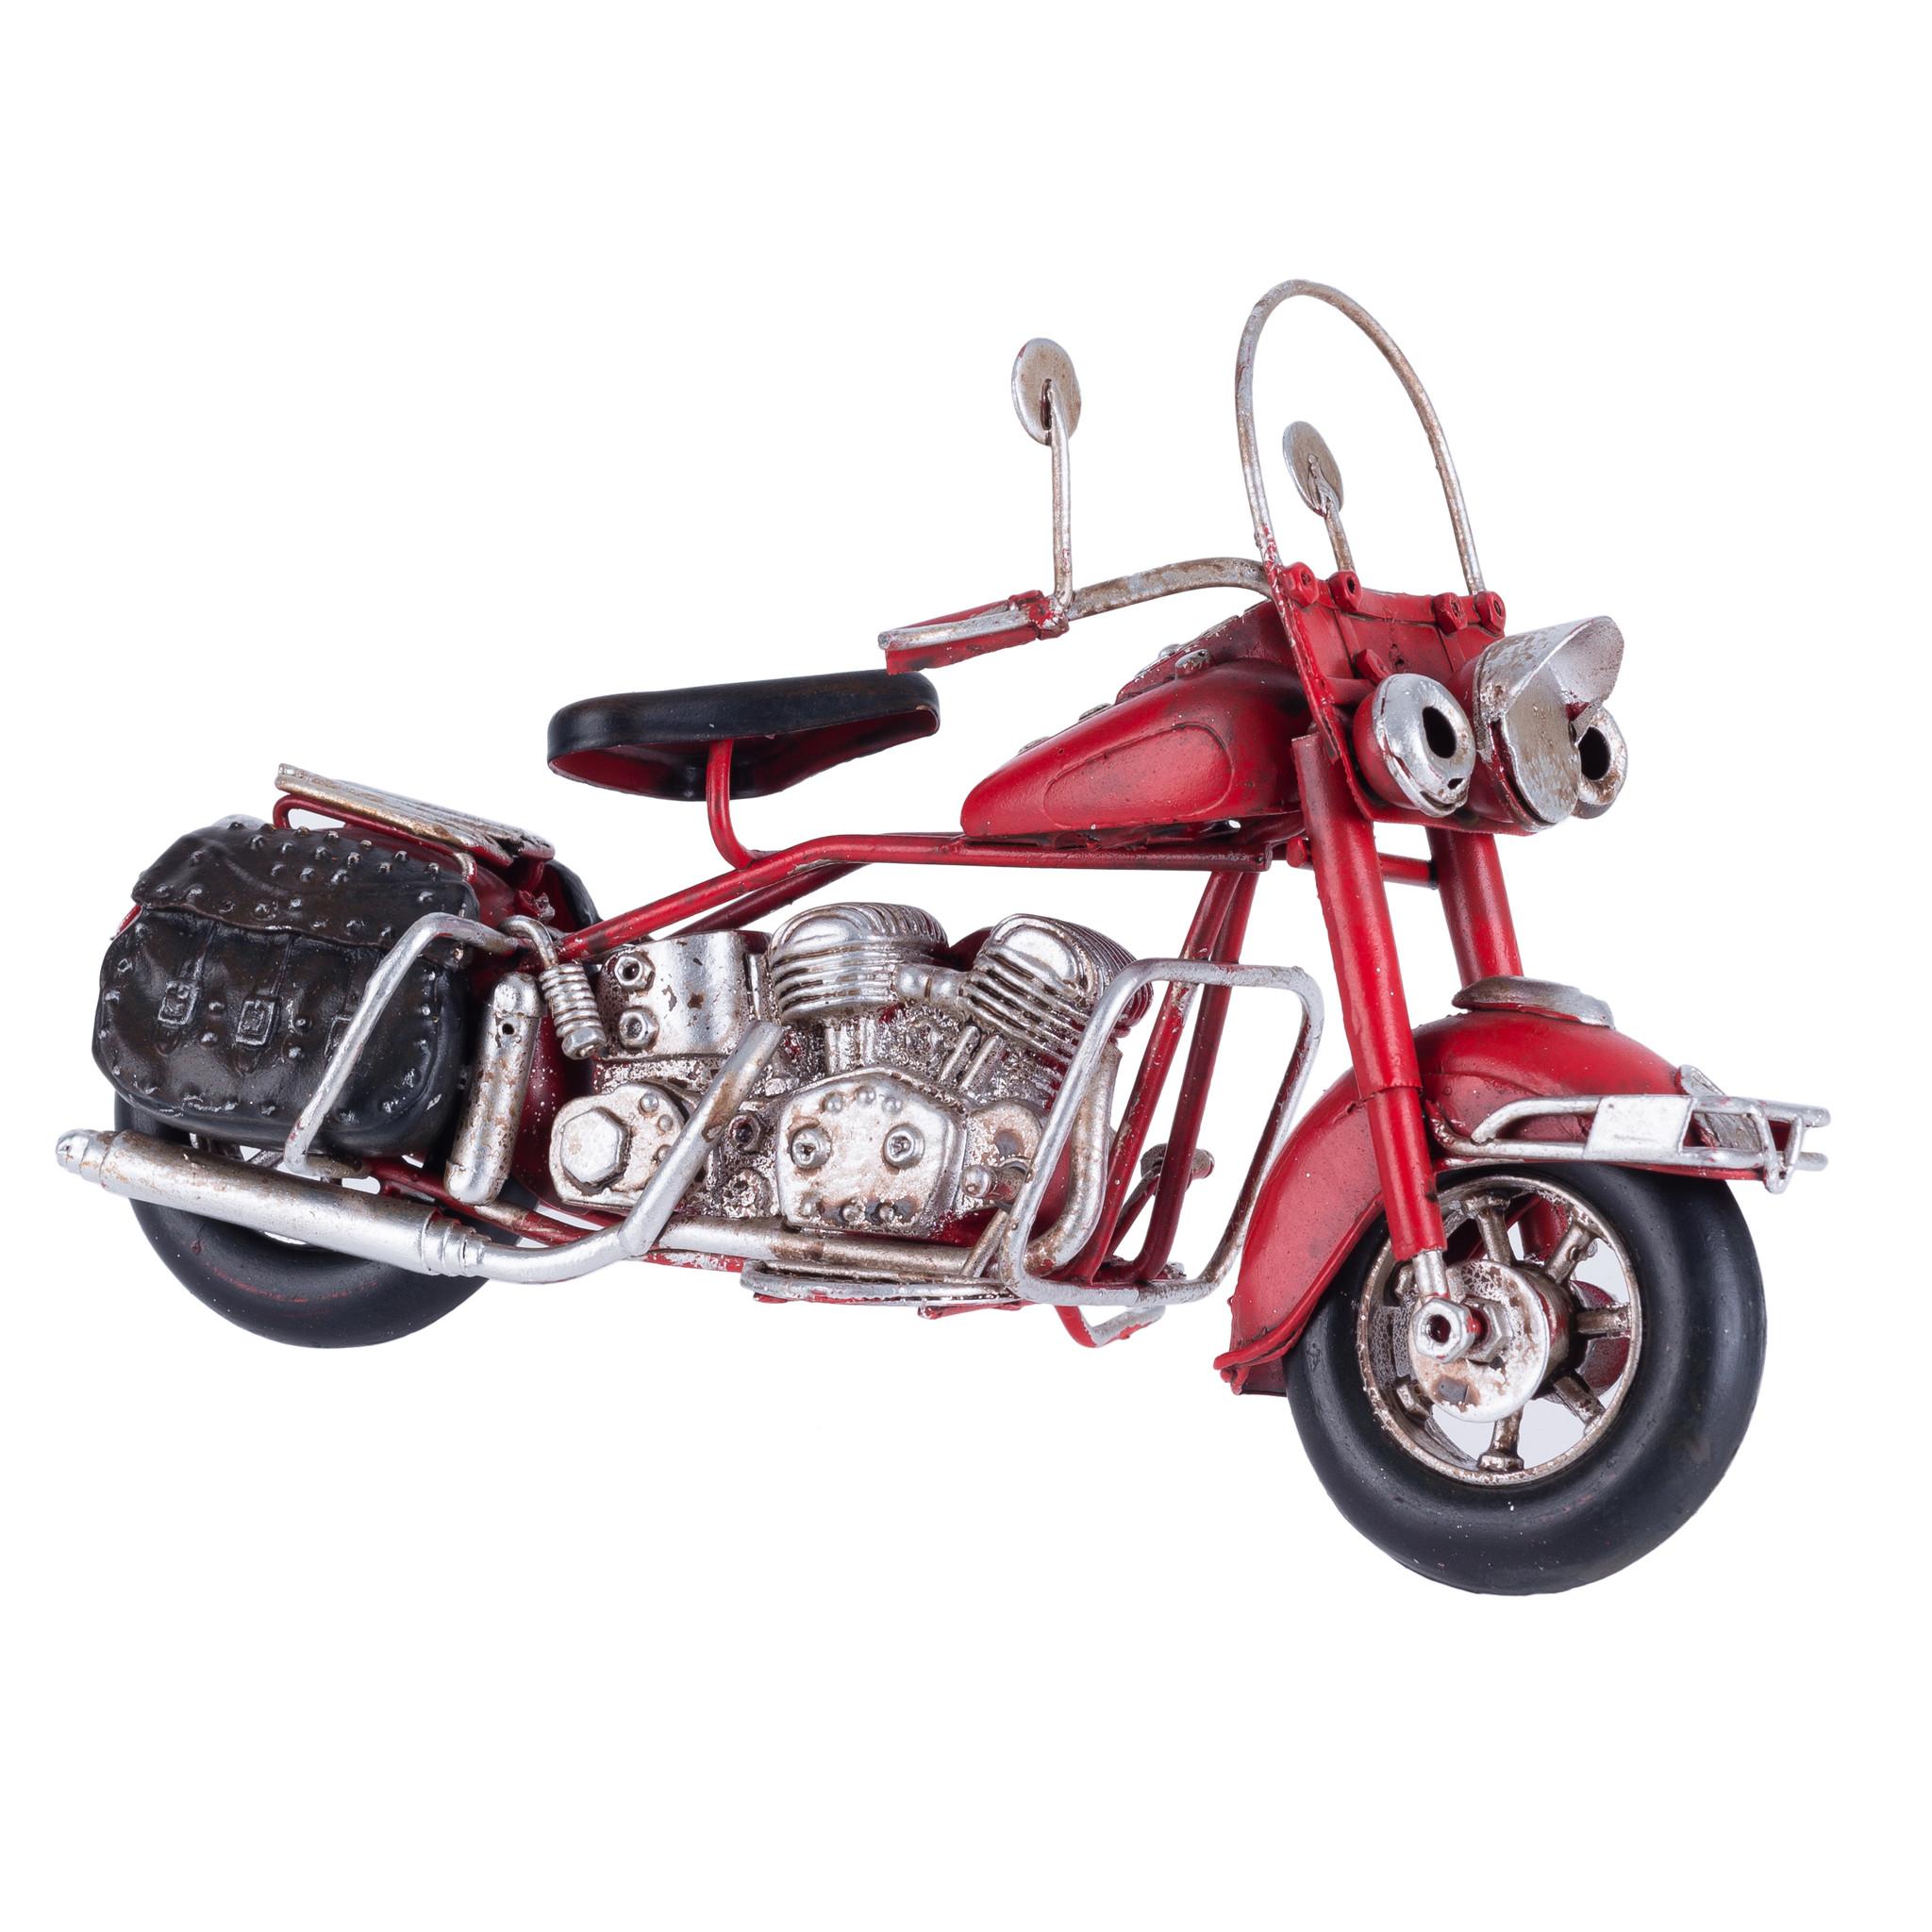 Декоративный мотоцикл PineroloДругое<br><br><br>Material: Металл<br>Ширина см: 19<br>Высота см: 12<br>Глубина см: 7